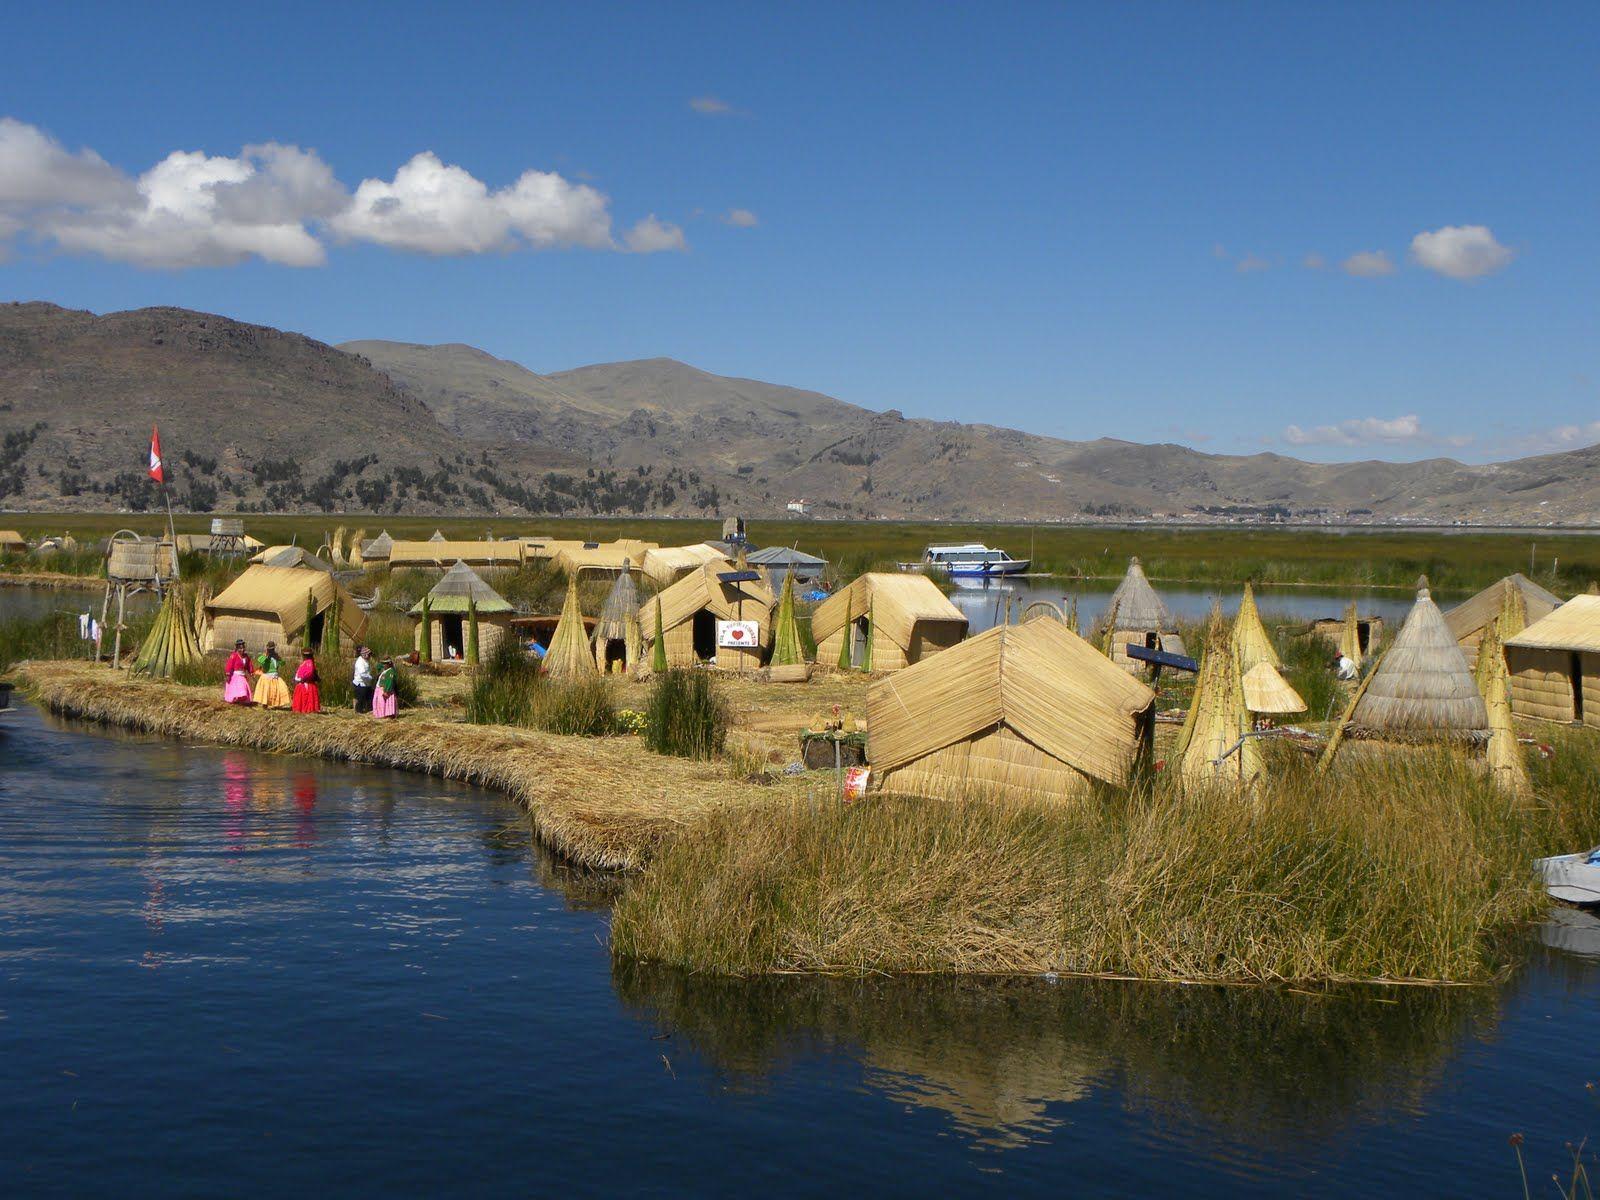 lago titicaca - Pesquisa Google | places I've been | Pinterest ...